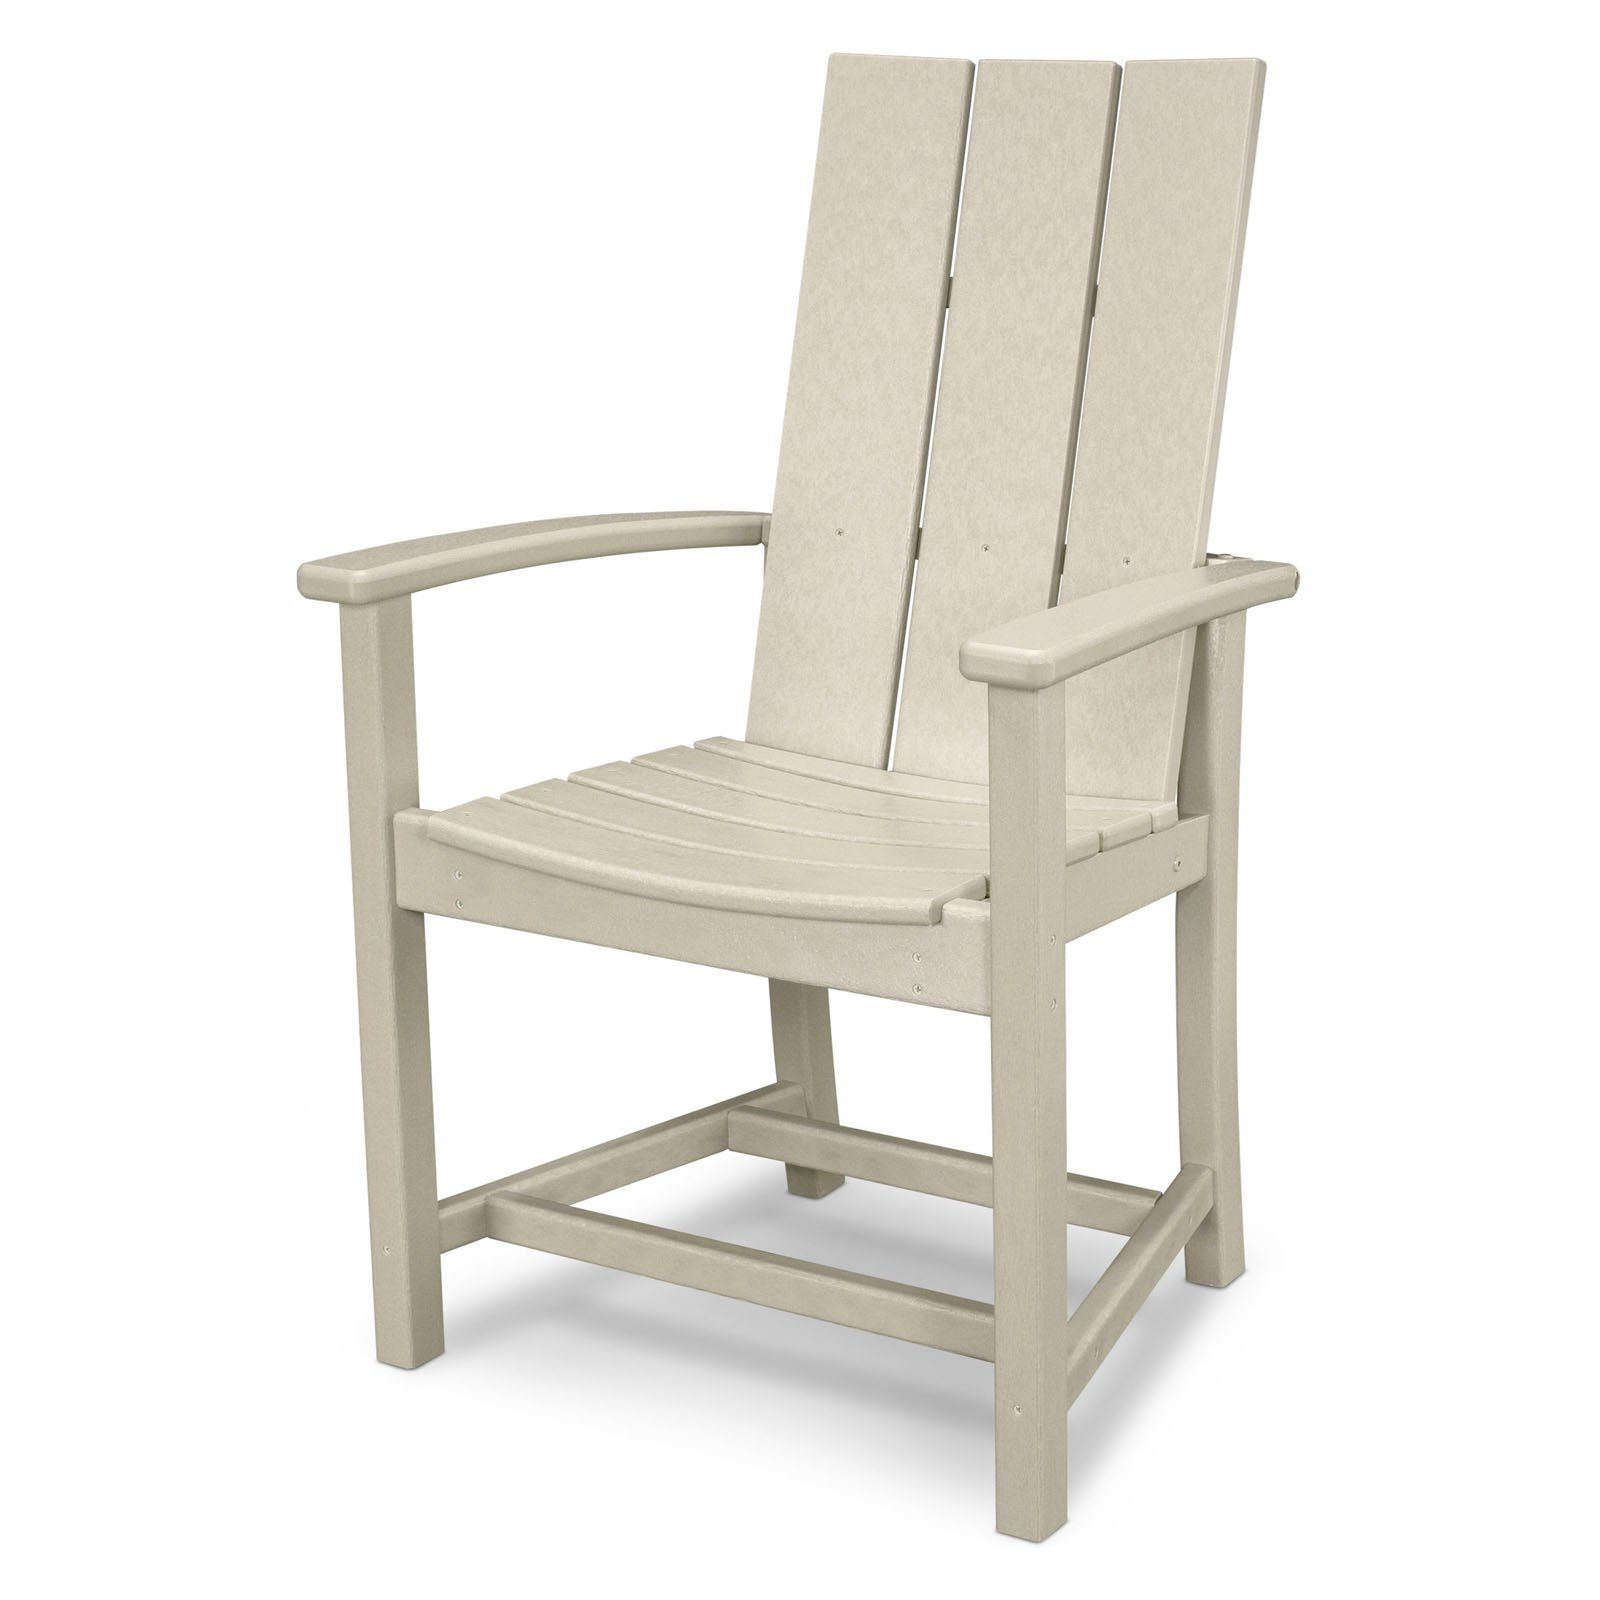 Polywood Modern Trio Adirondack Dining Chair Wooden Pallet